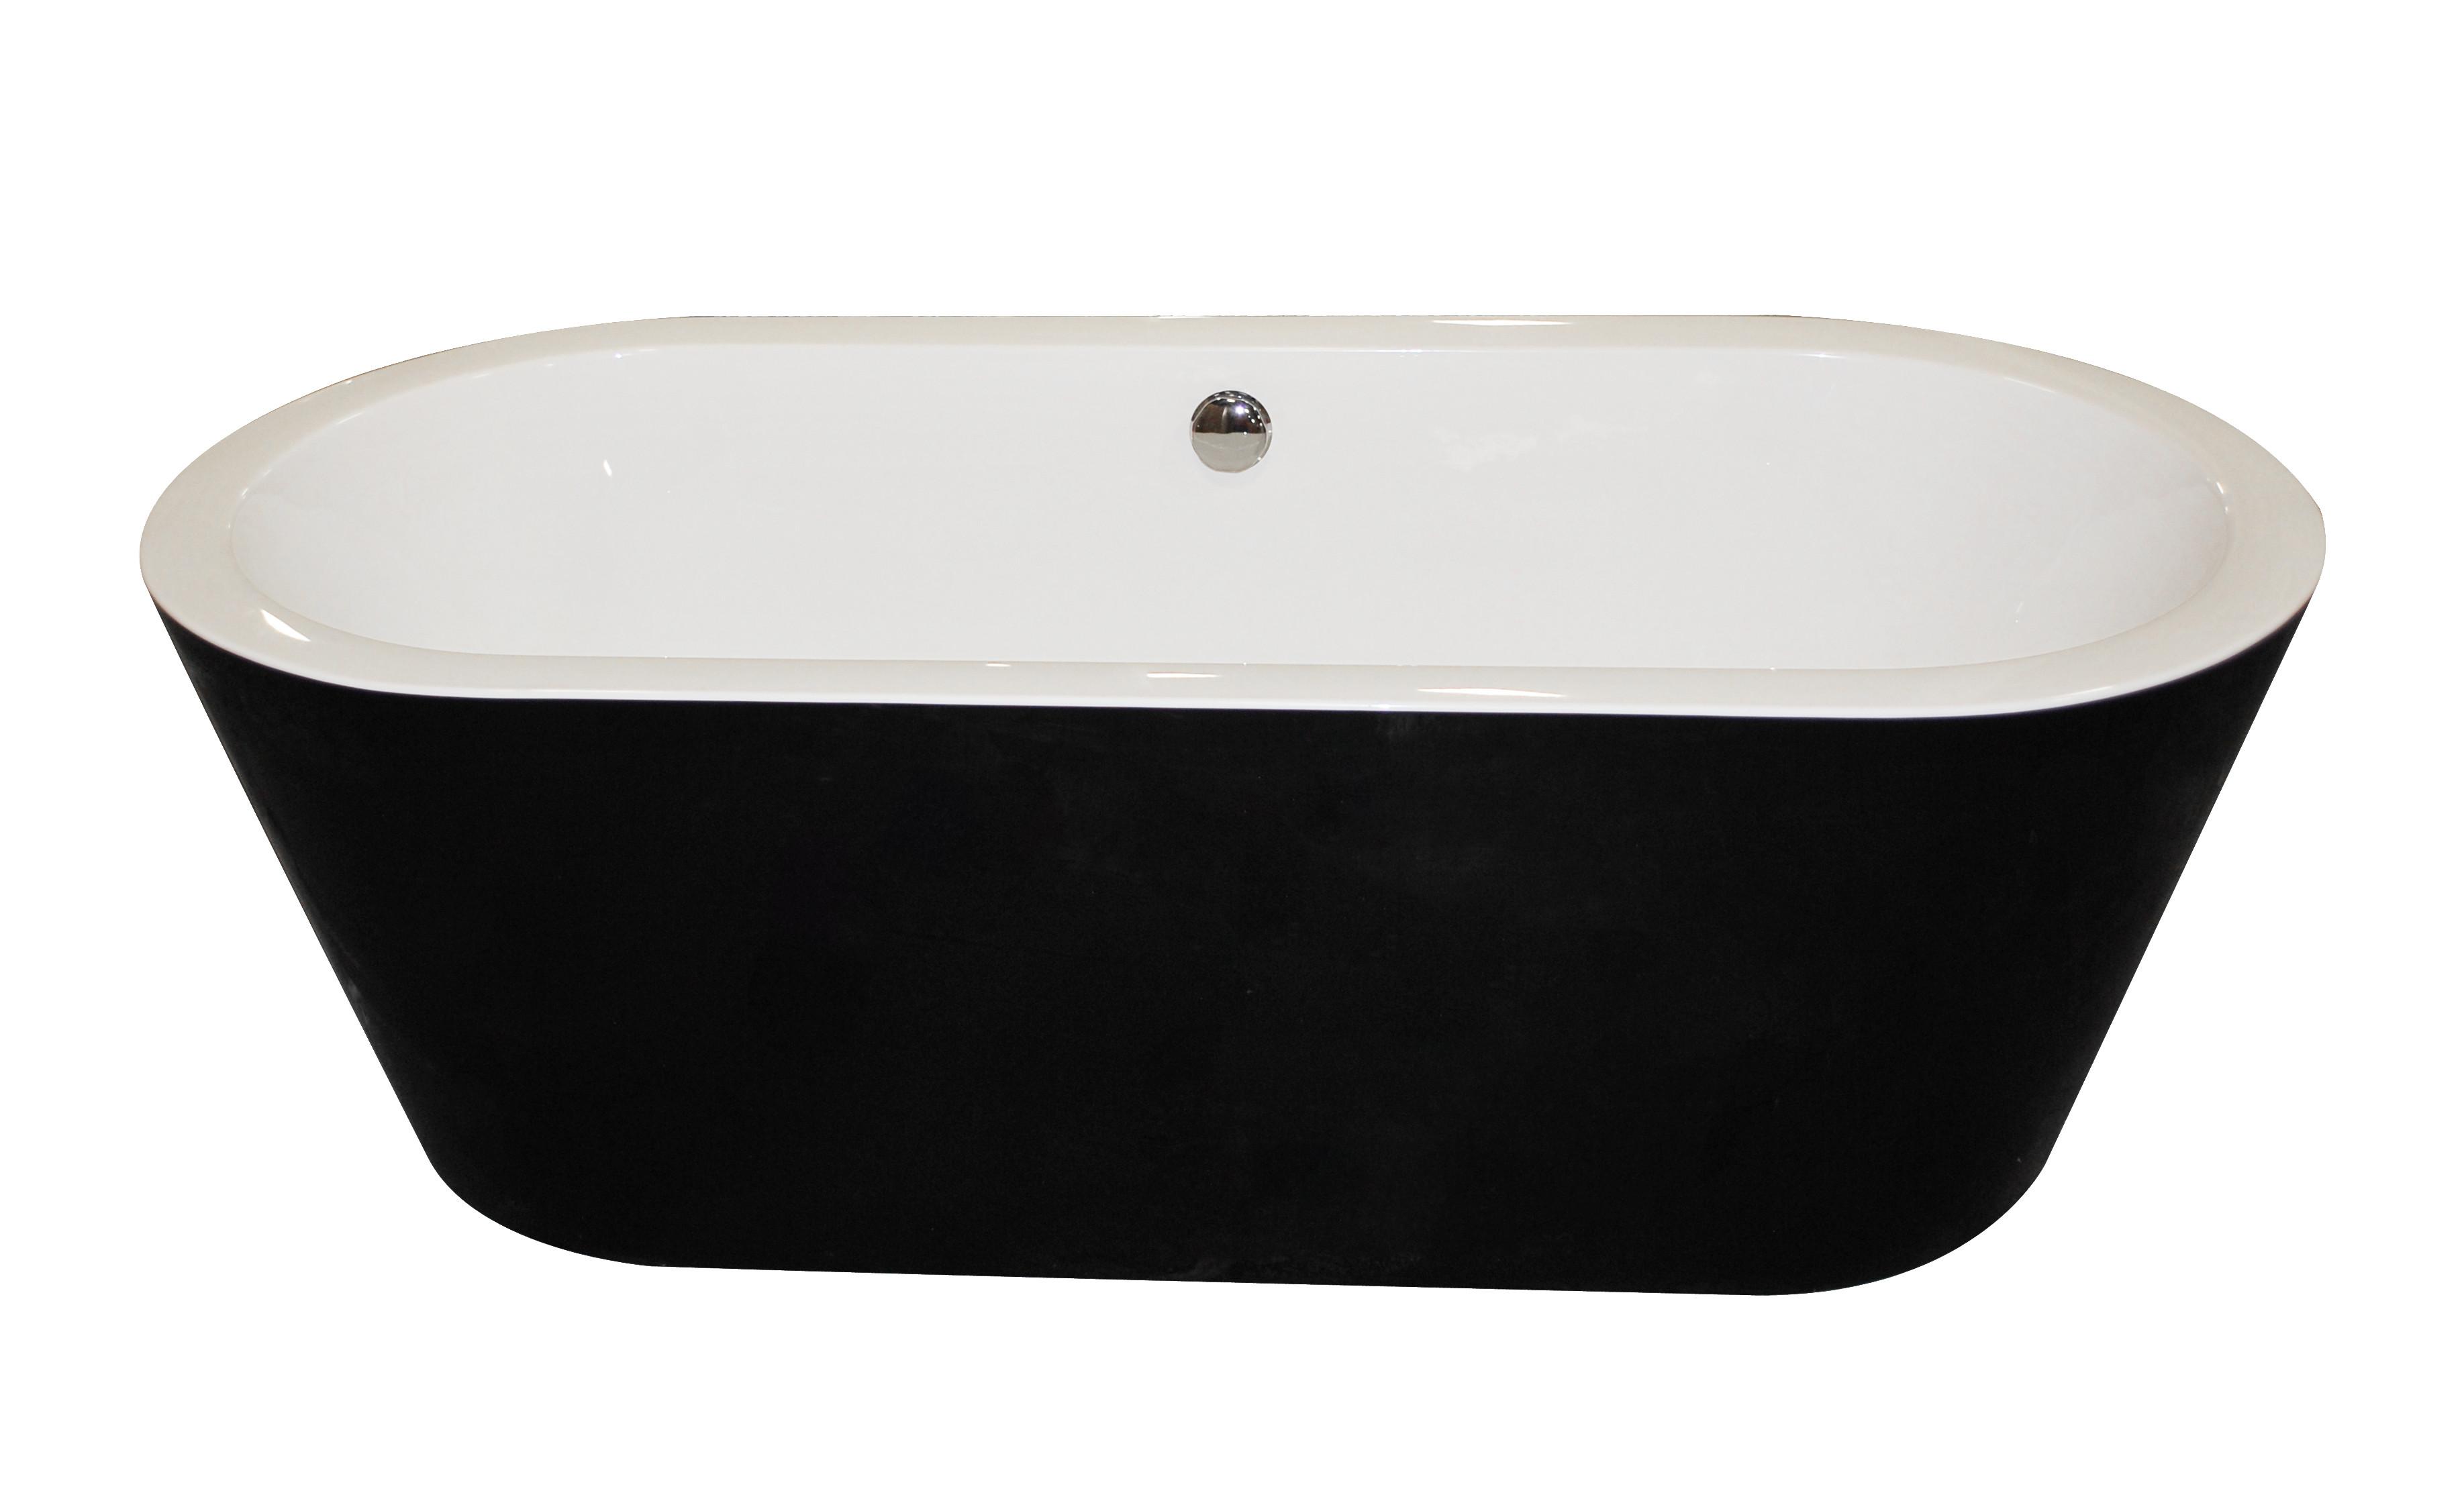 Anzzi FT-AZ011 Dualita Center Drain Freestanding Bathtub in Glossy Black